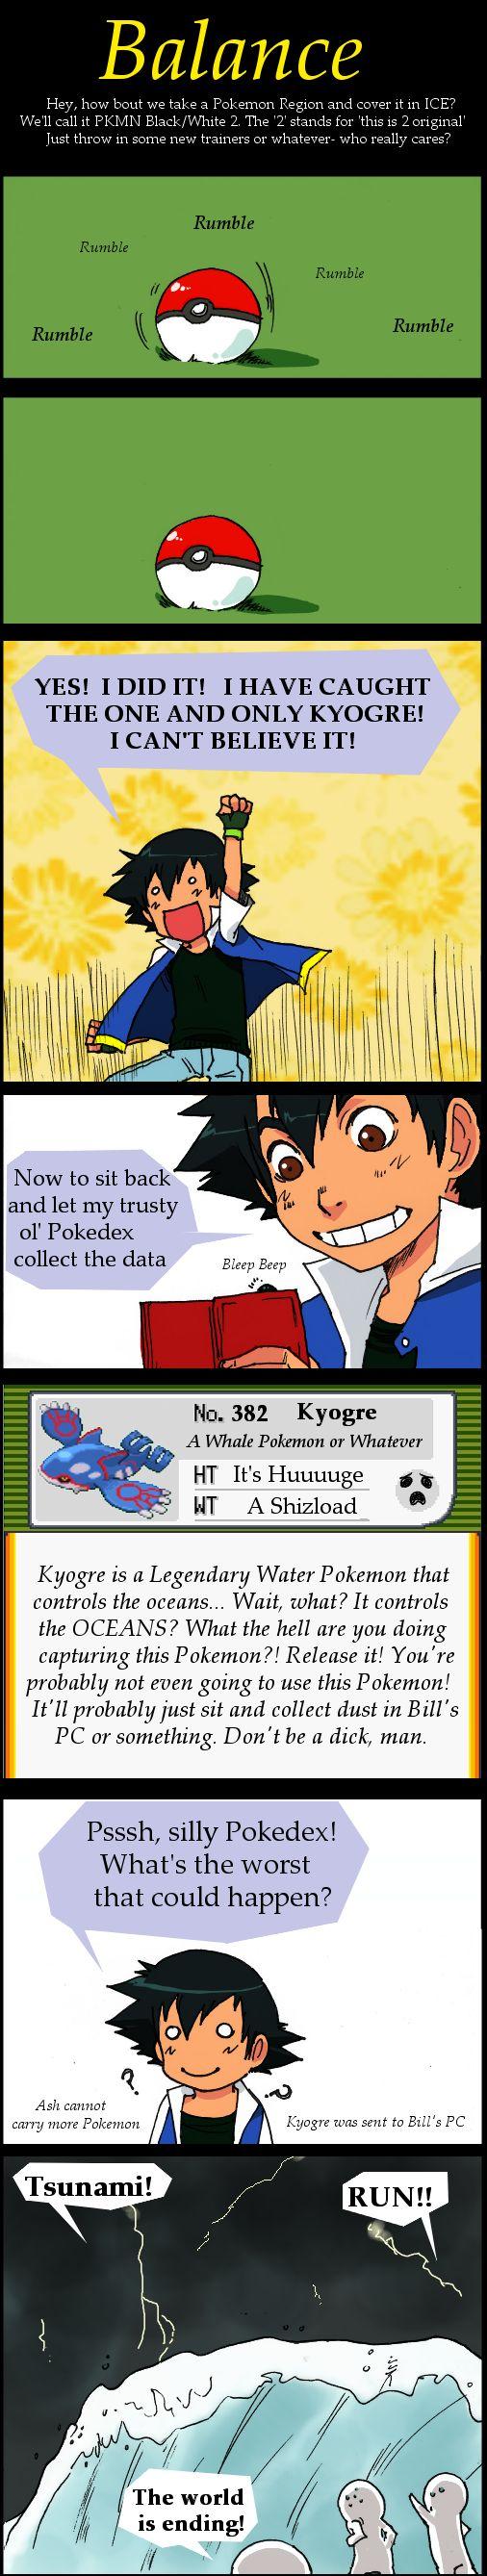 Pokemon: Balance!